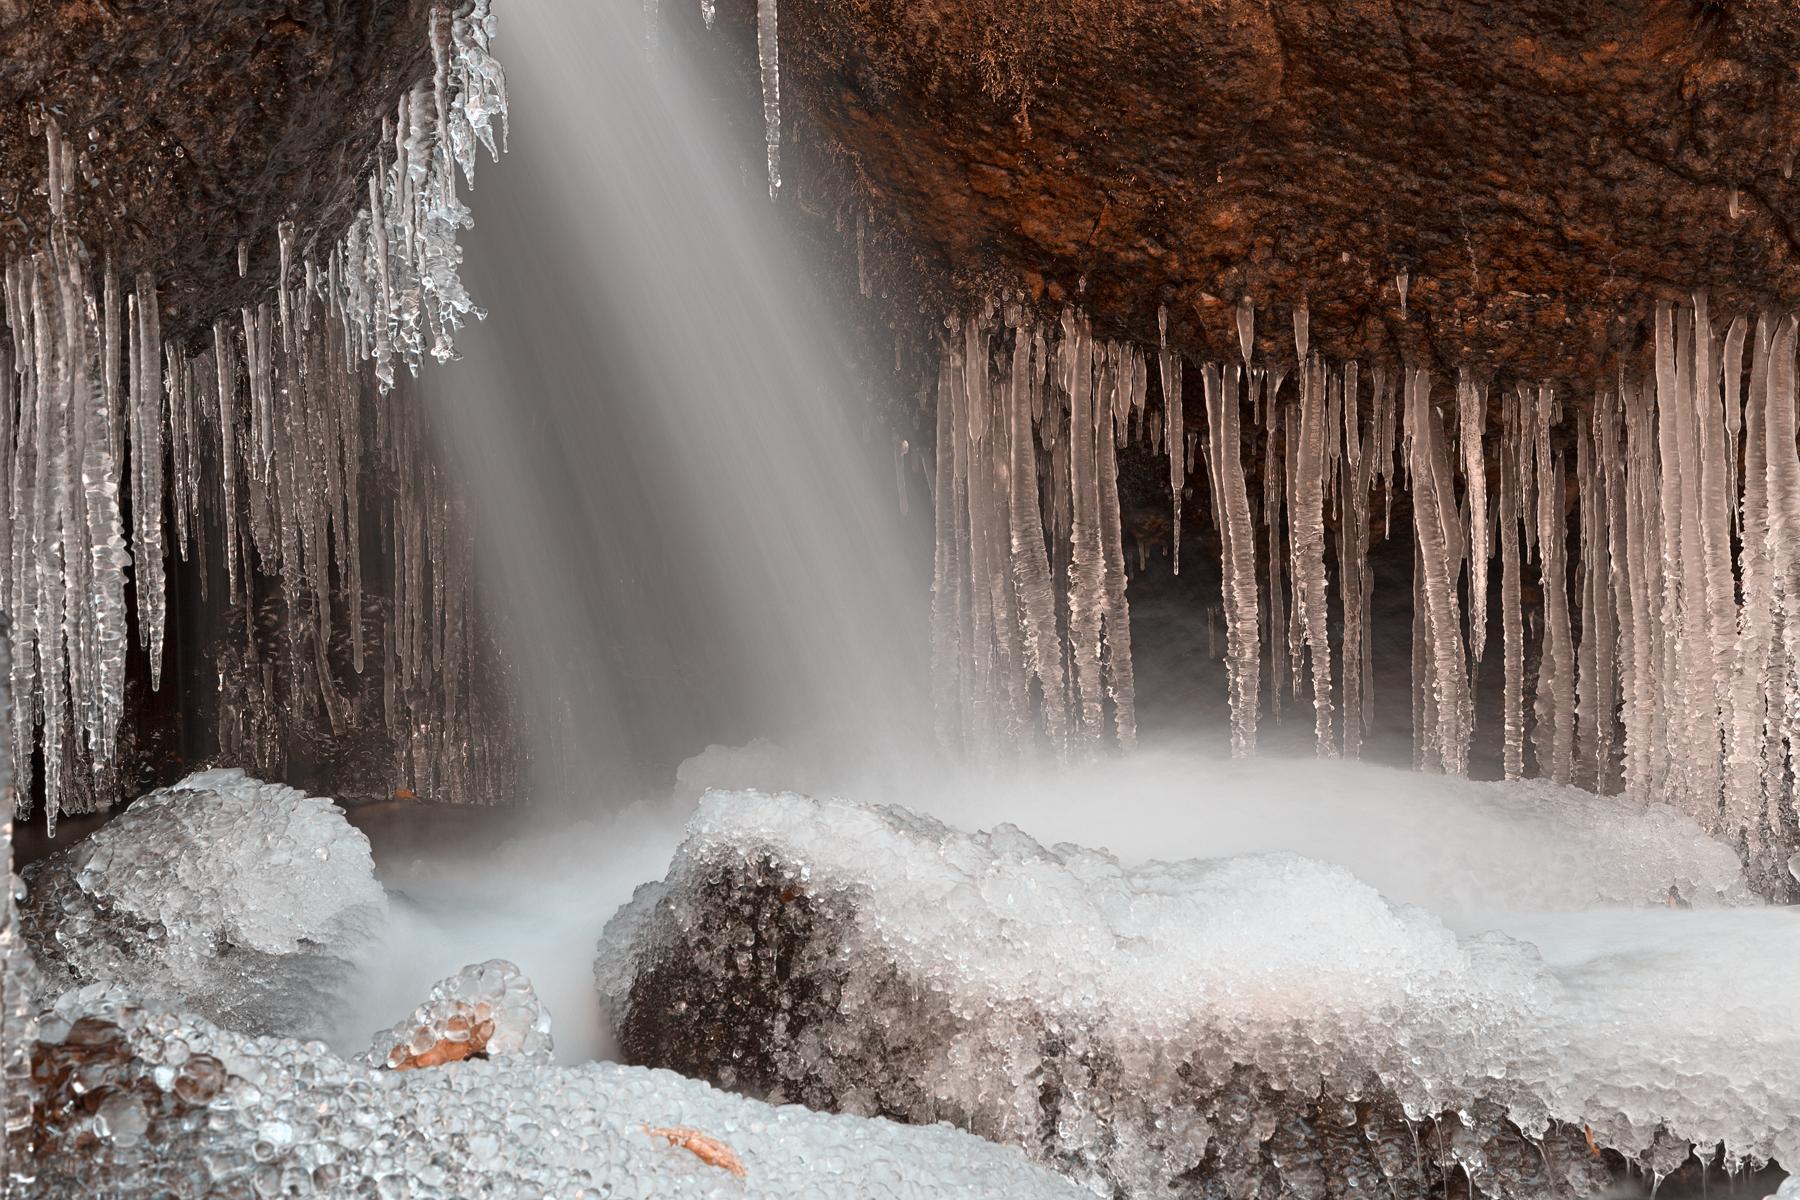 Stream of Frozen Hope - HDR, America, Scene, Red, River, HQ Photo